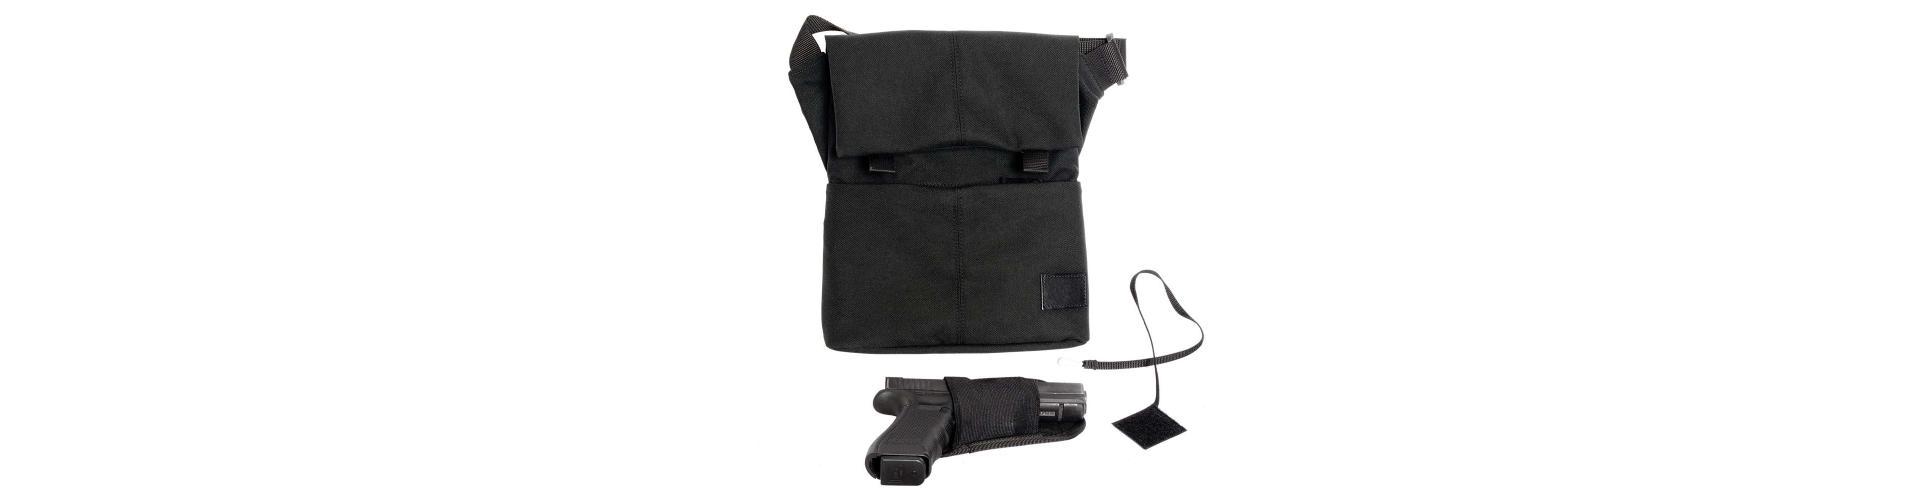 Обзор сумки кобуры A-line A39